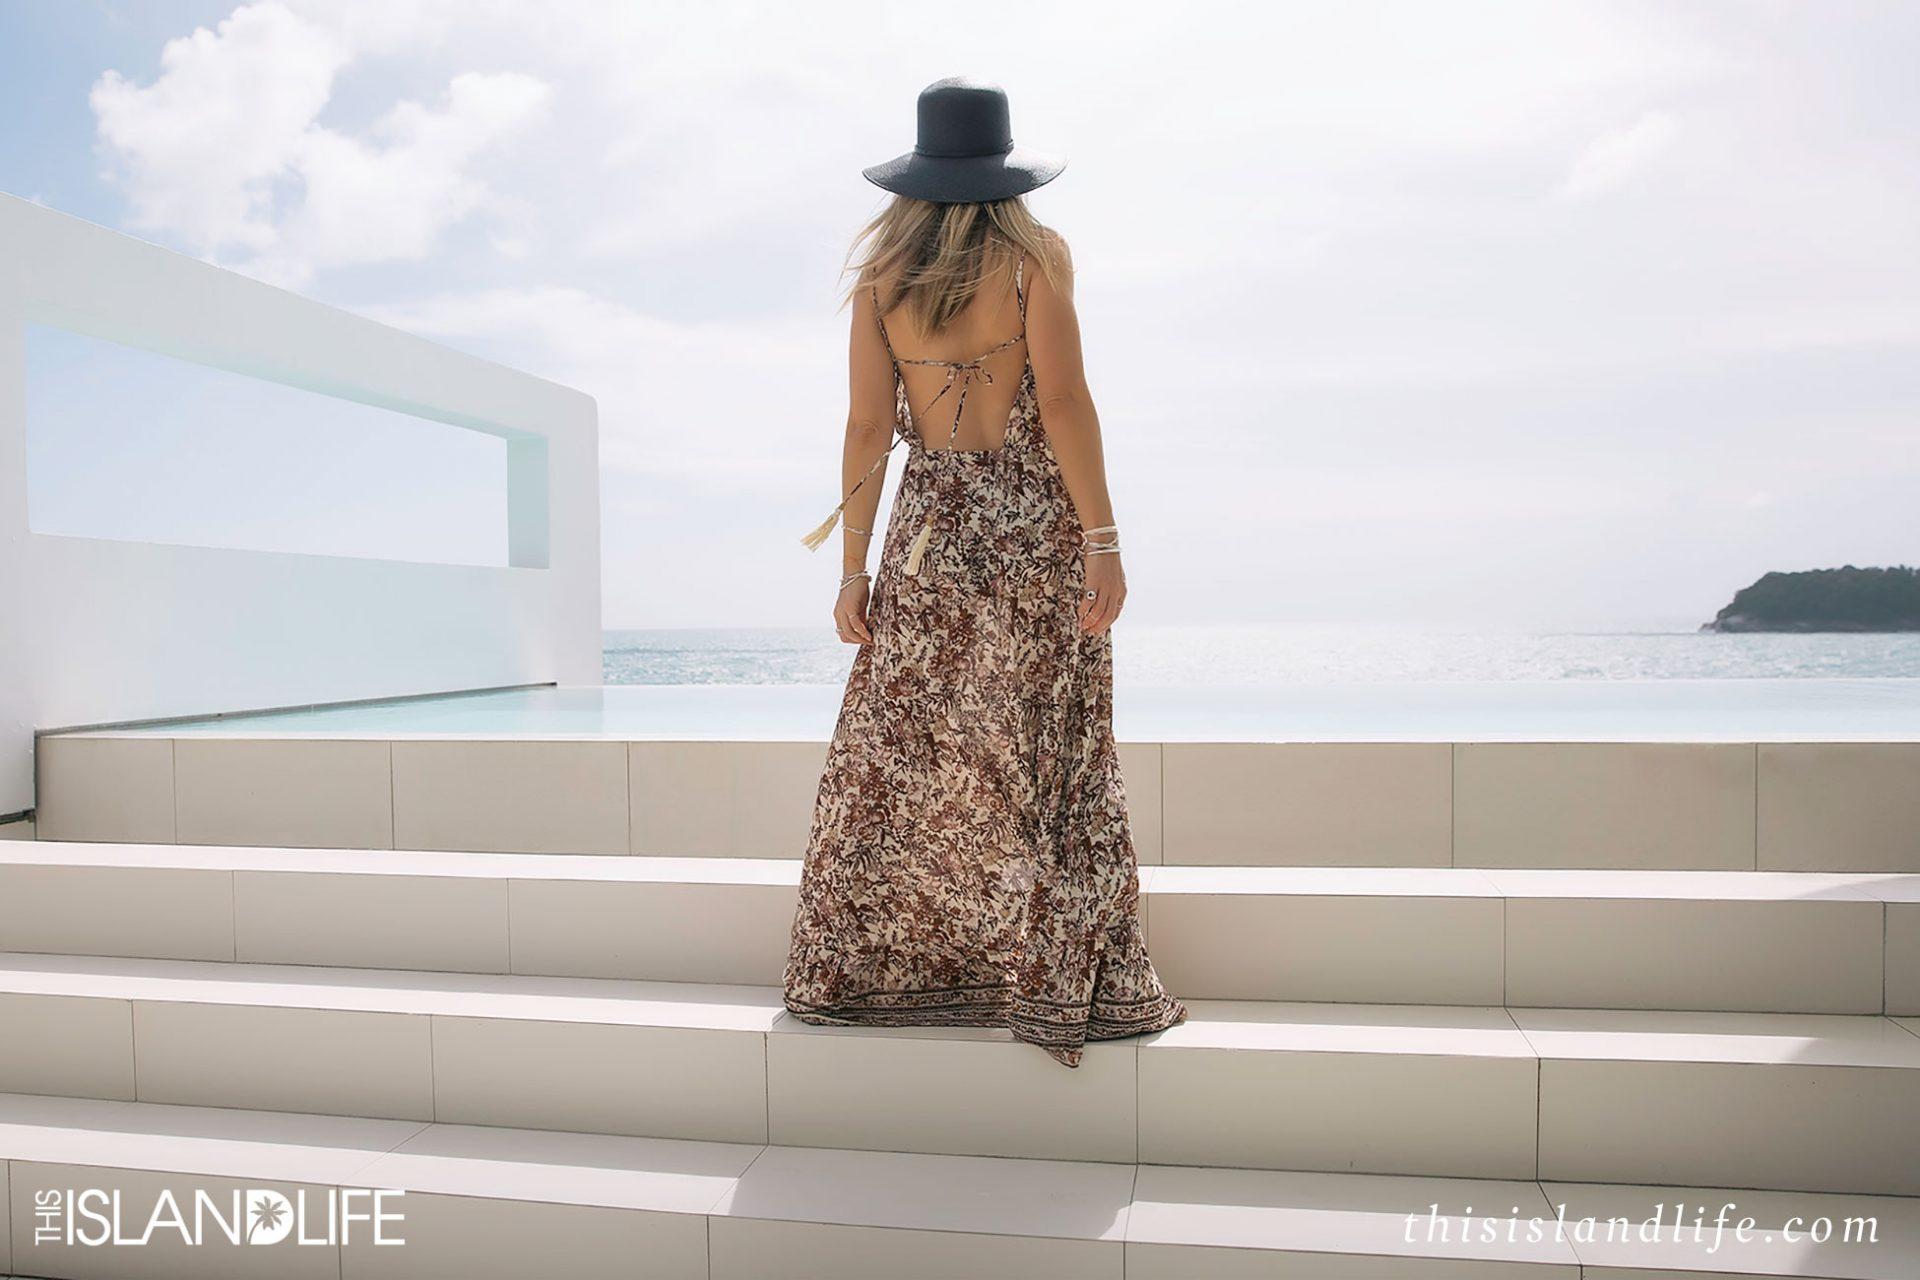 this-island-life_helen-kaminski_phuket-thailand_25-wm